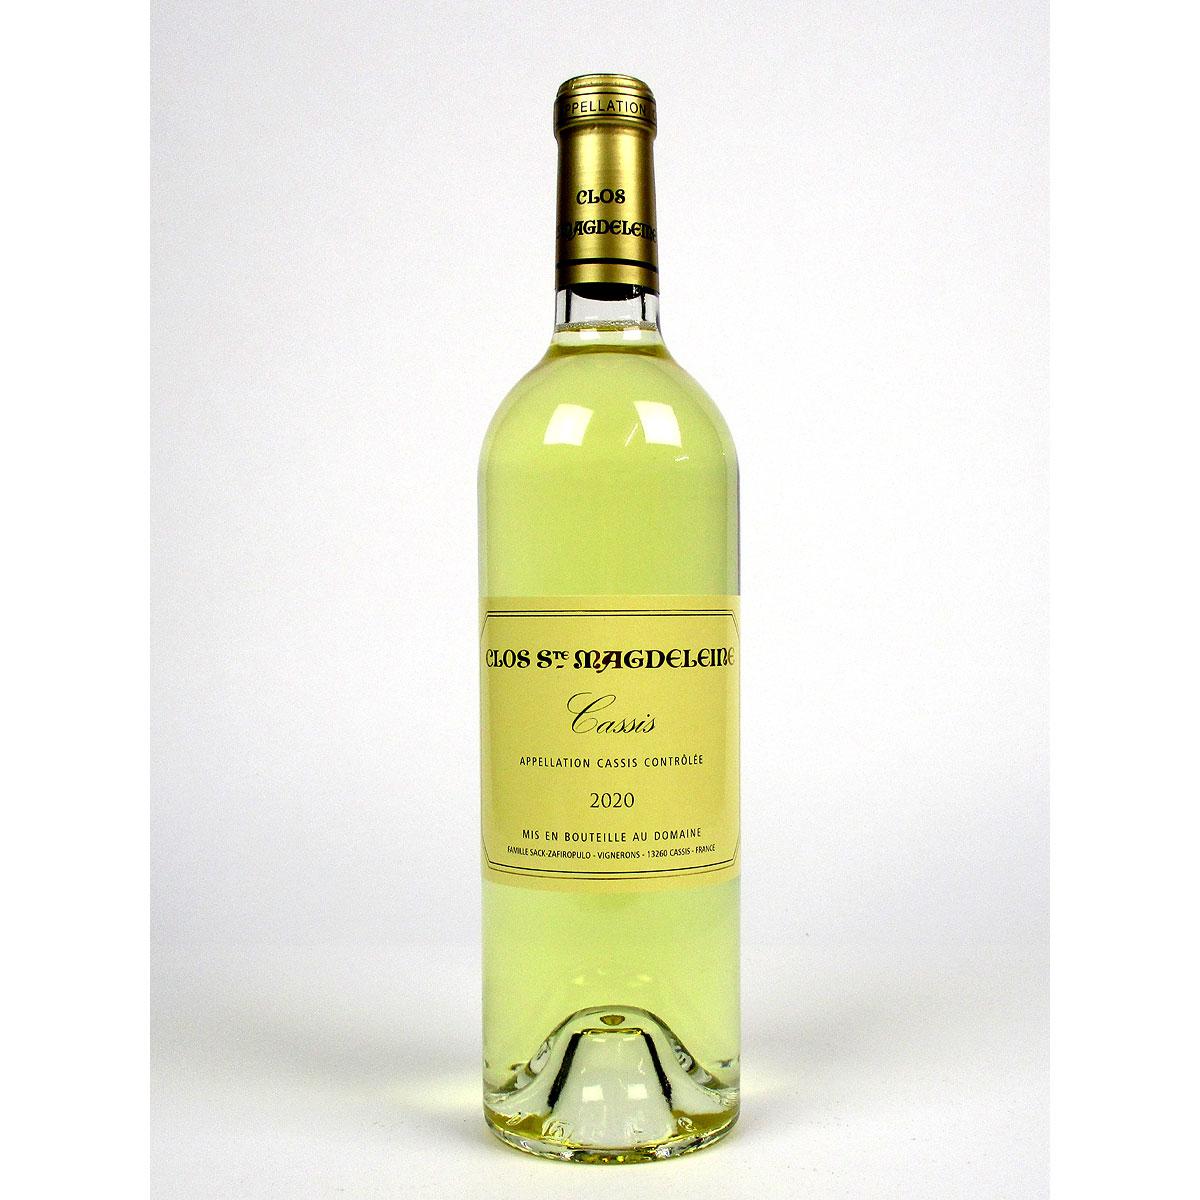 Cassis: Clos Sainte Magdeleine Blanc 2020 - Bottle